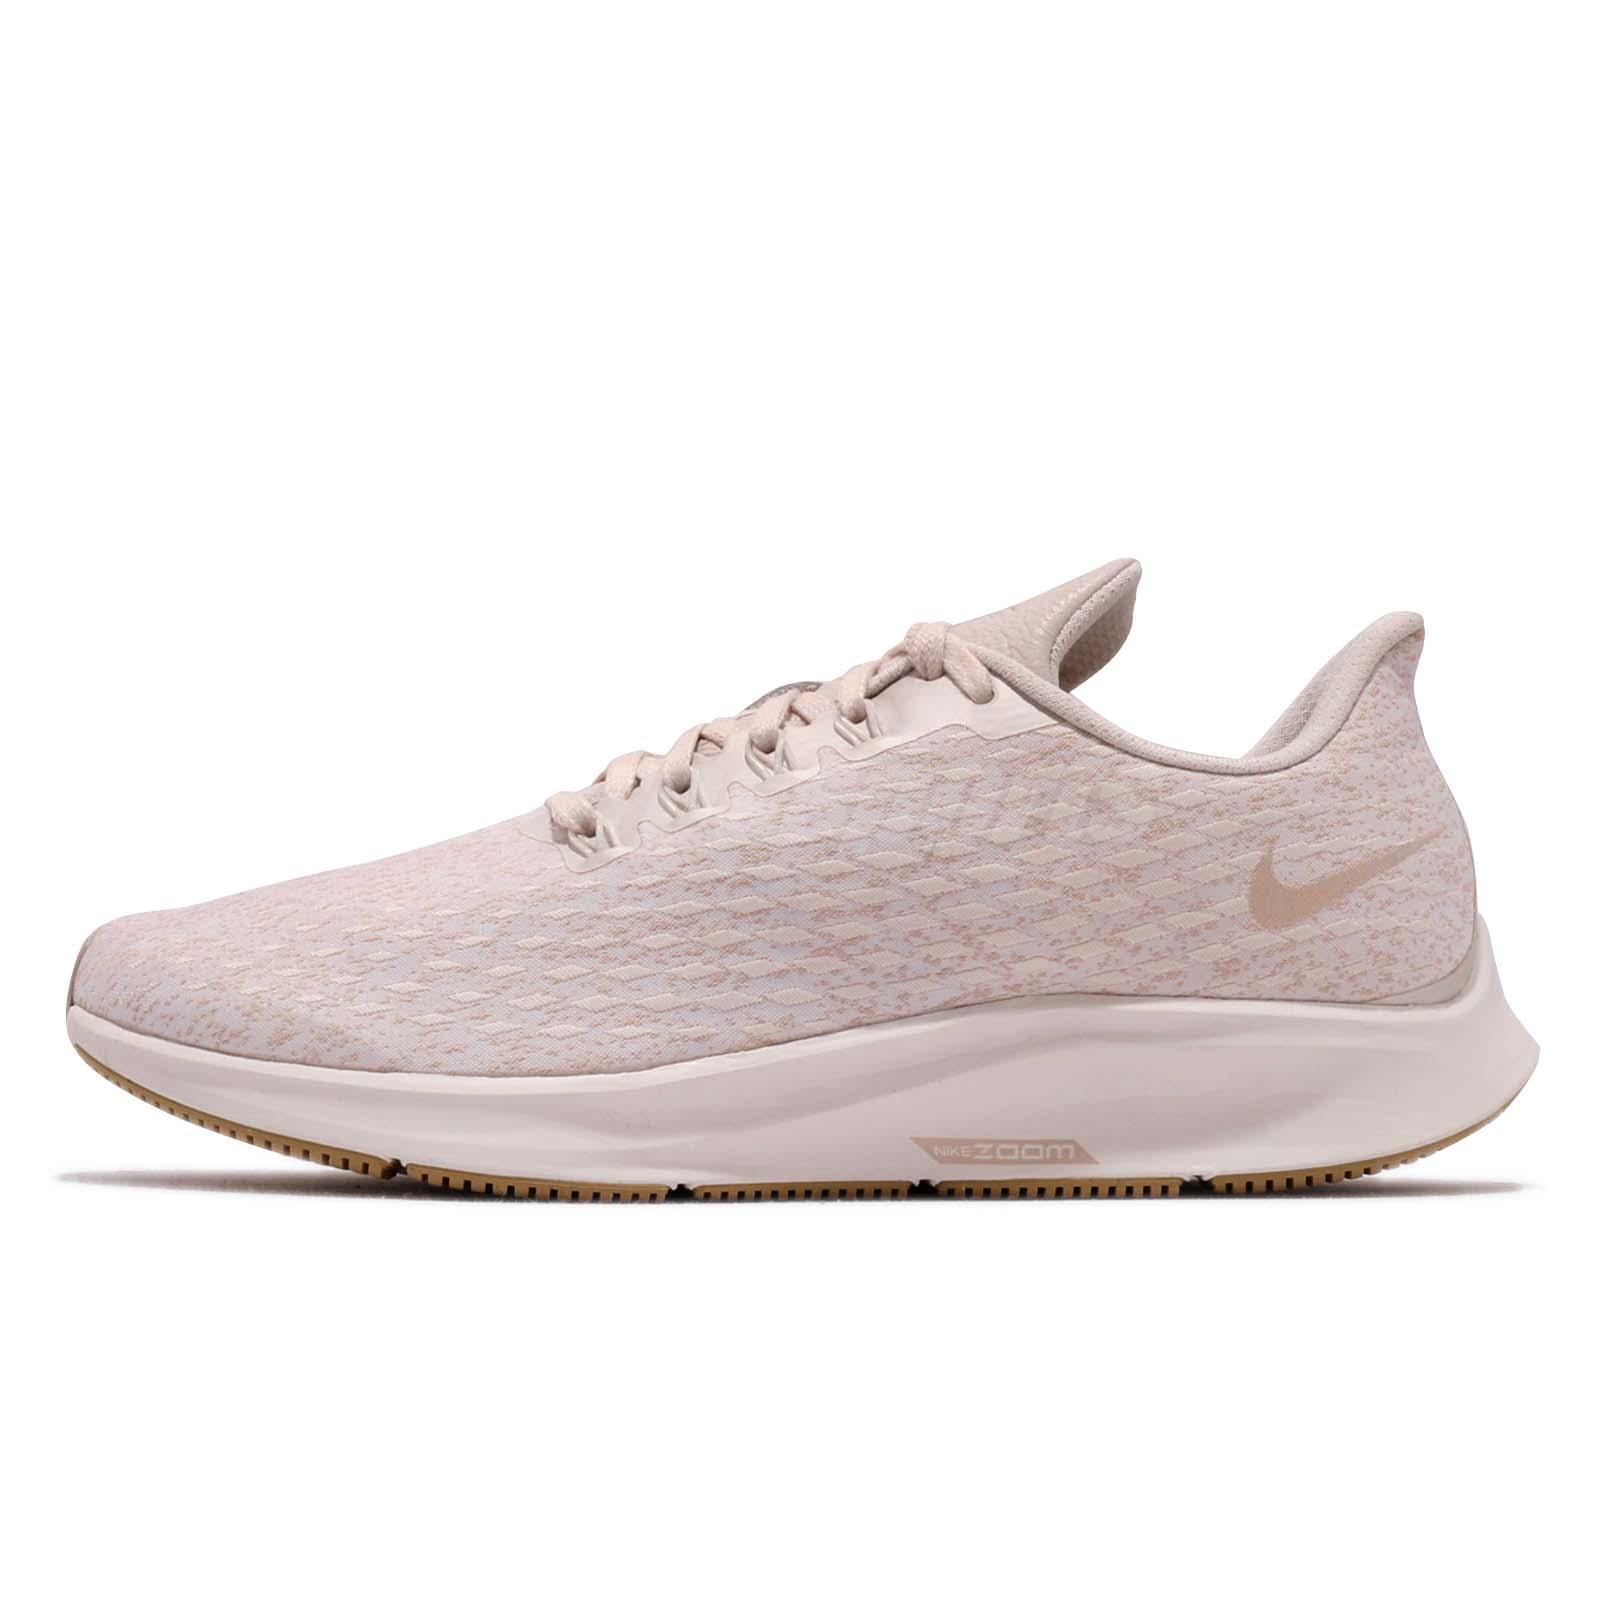 74e9ebedbf501 Nike Wmns Air Zoom Pegasus 35 PRM Particle Beige Women Running Shoes AH8392- 800